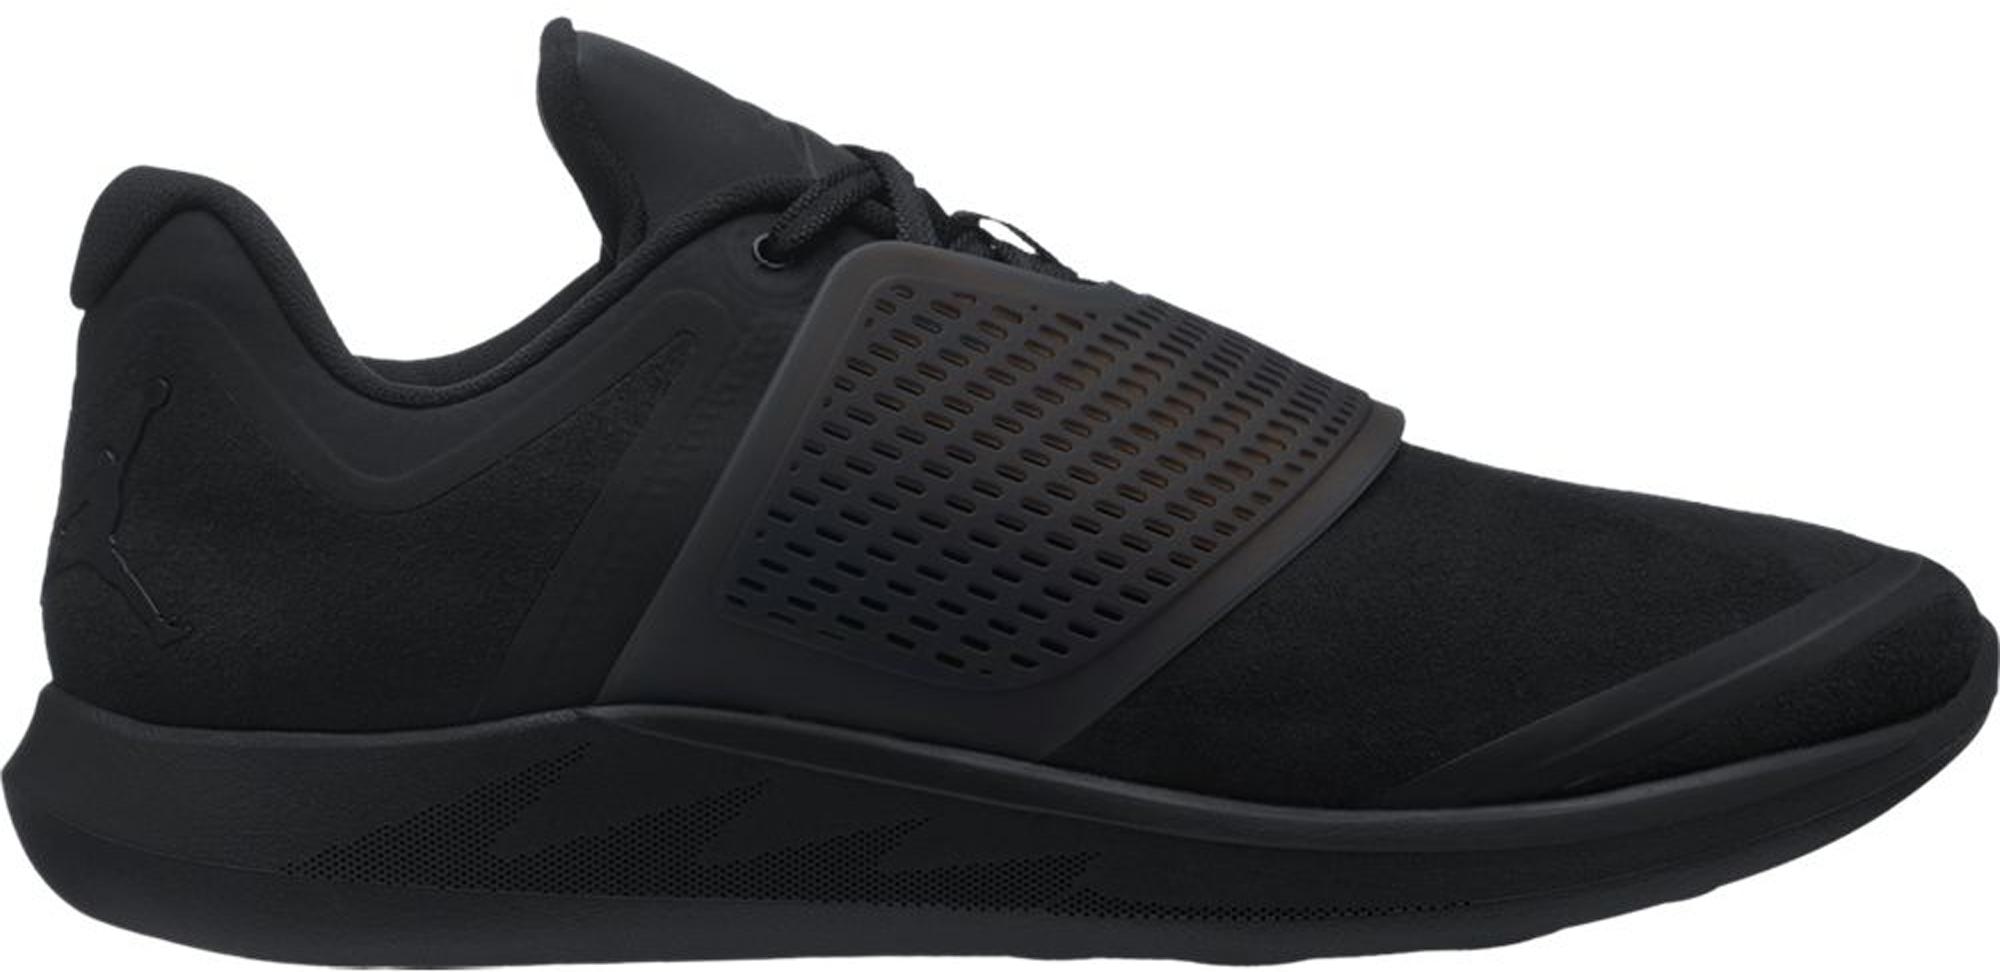 Jordan Grind 2 Black - AO9567-001